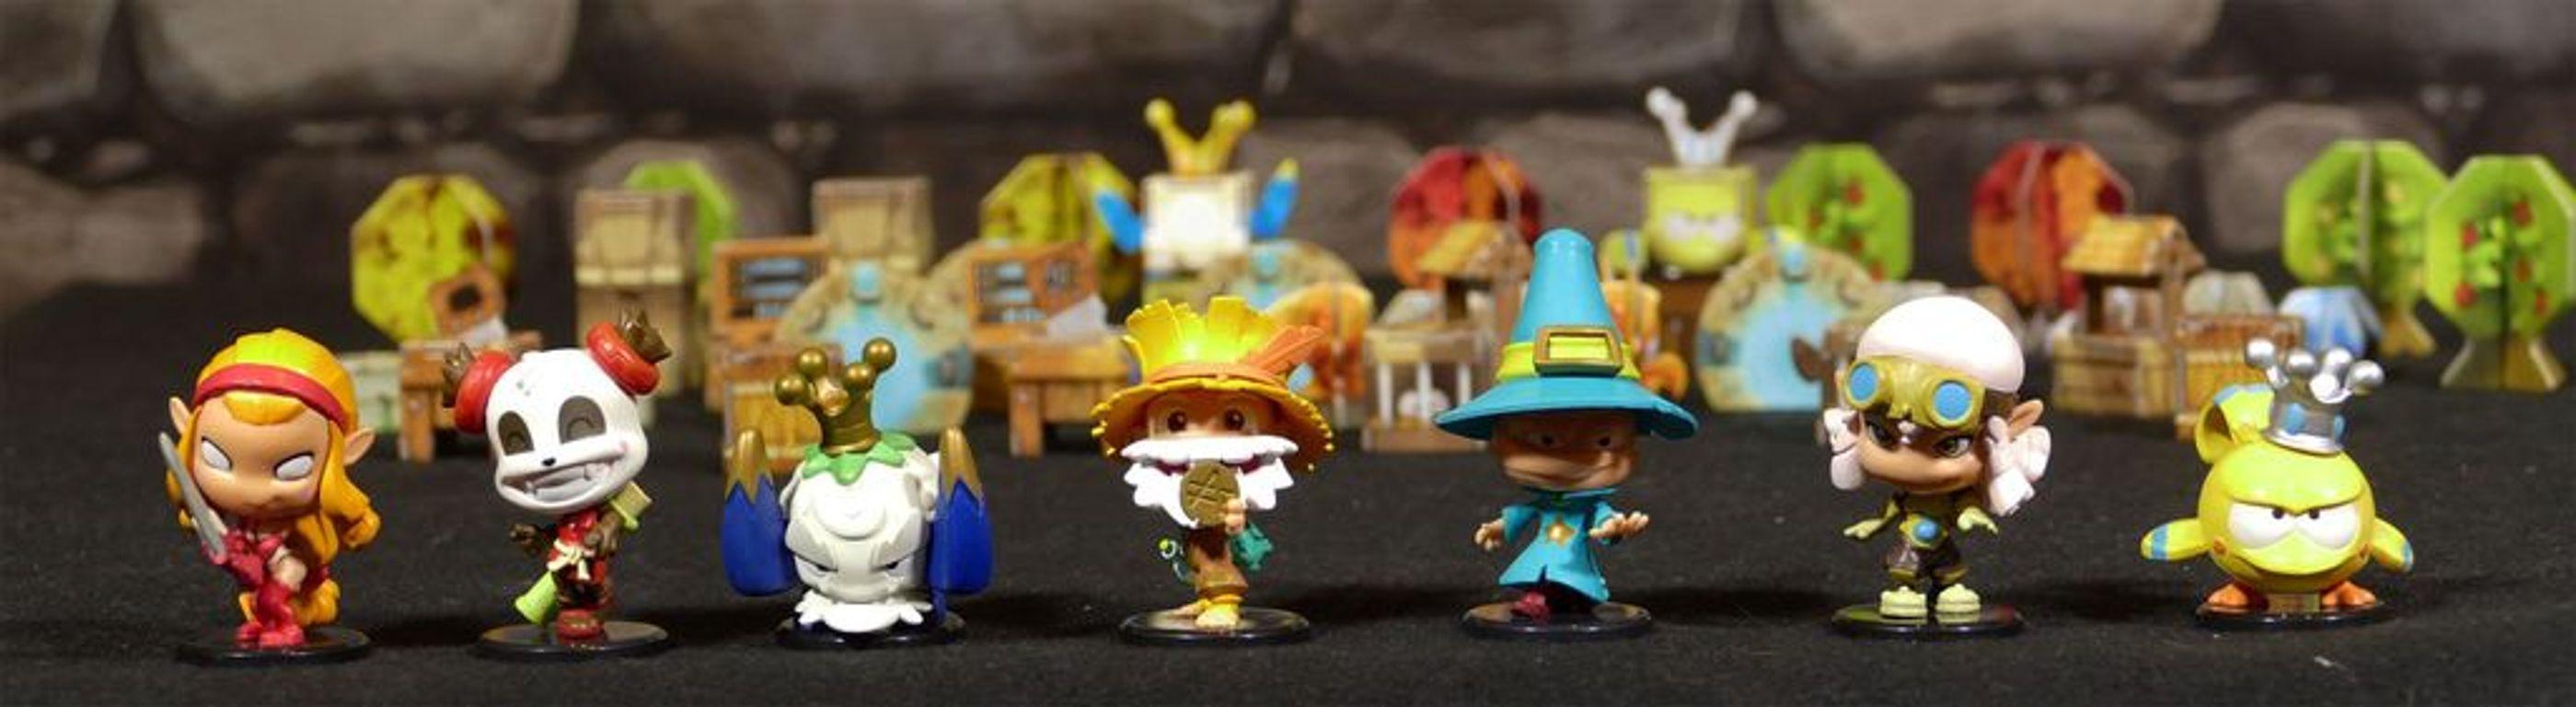 Krosmaster: Quest miniatures